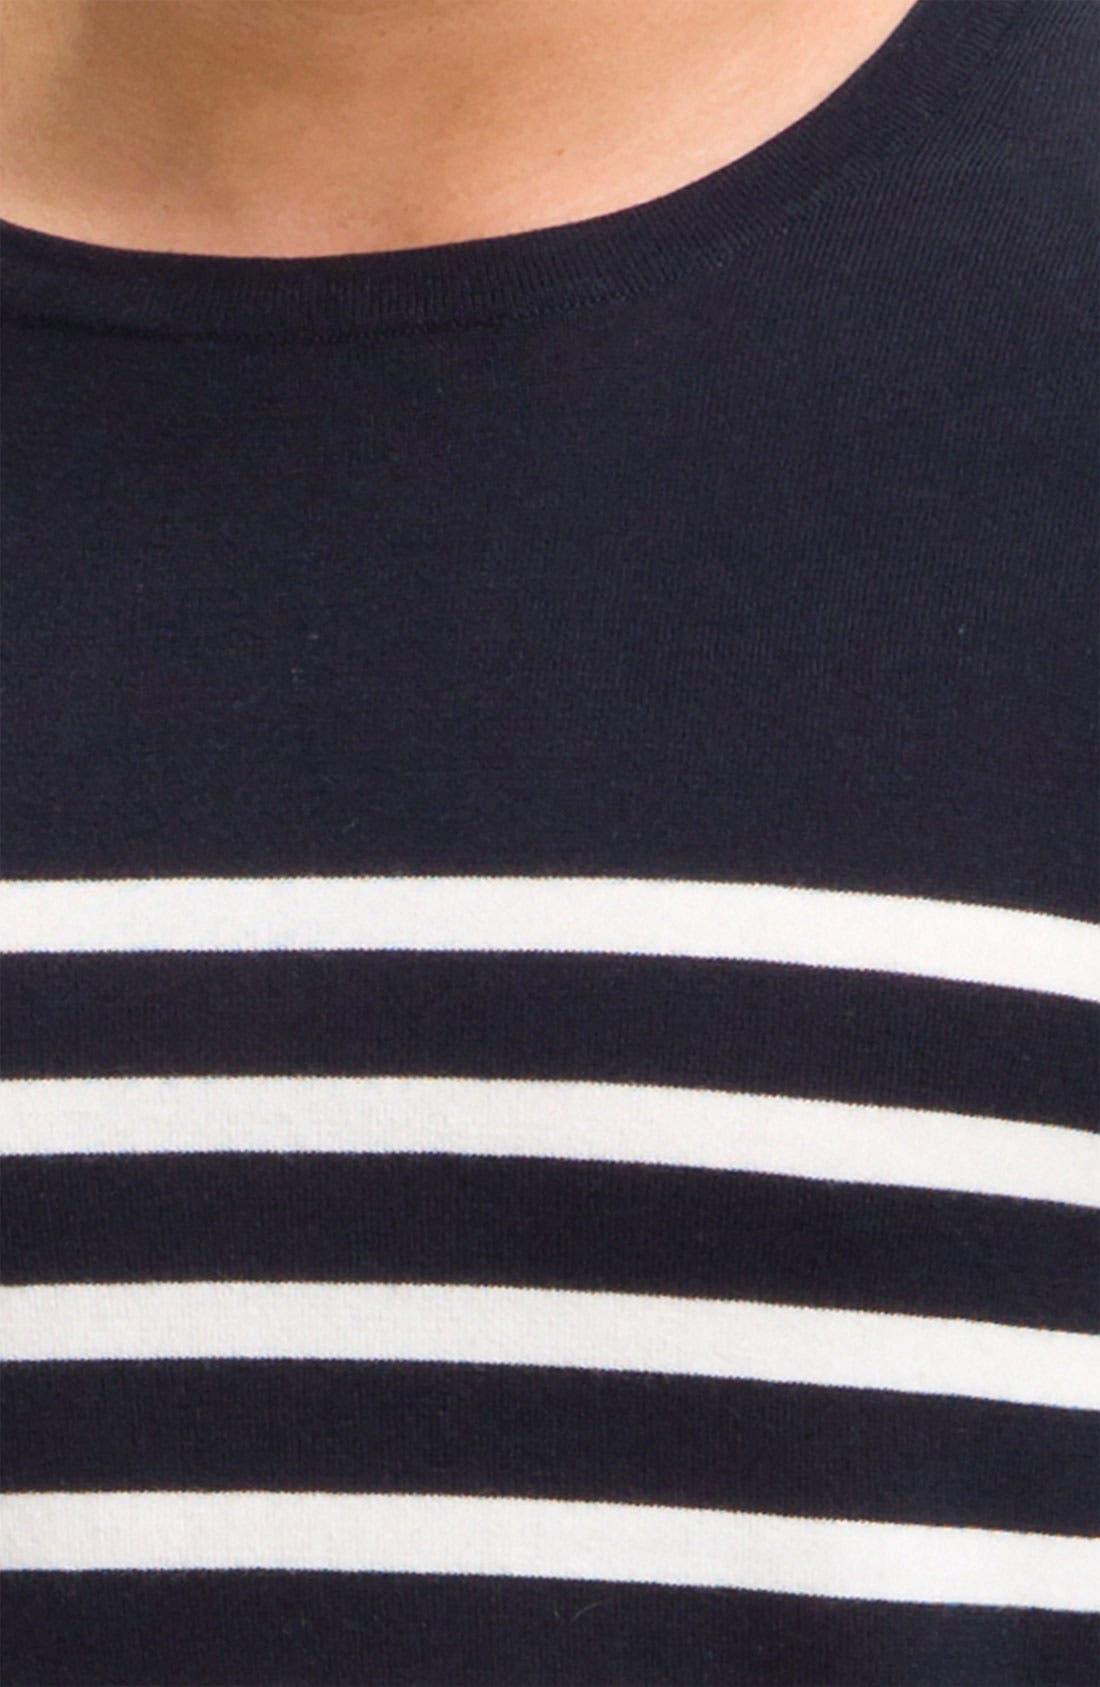 Alternate Image 3  - rag & bone 'Basque' Crewneck Sweater